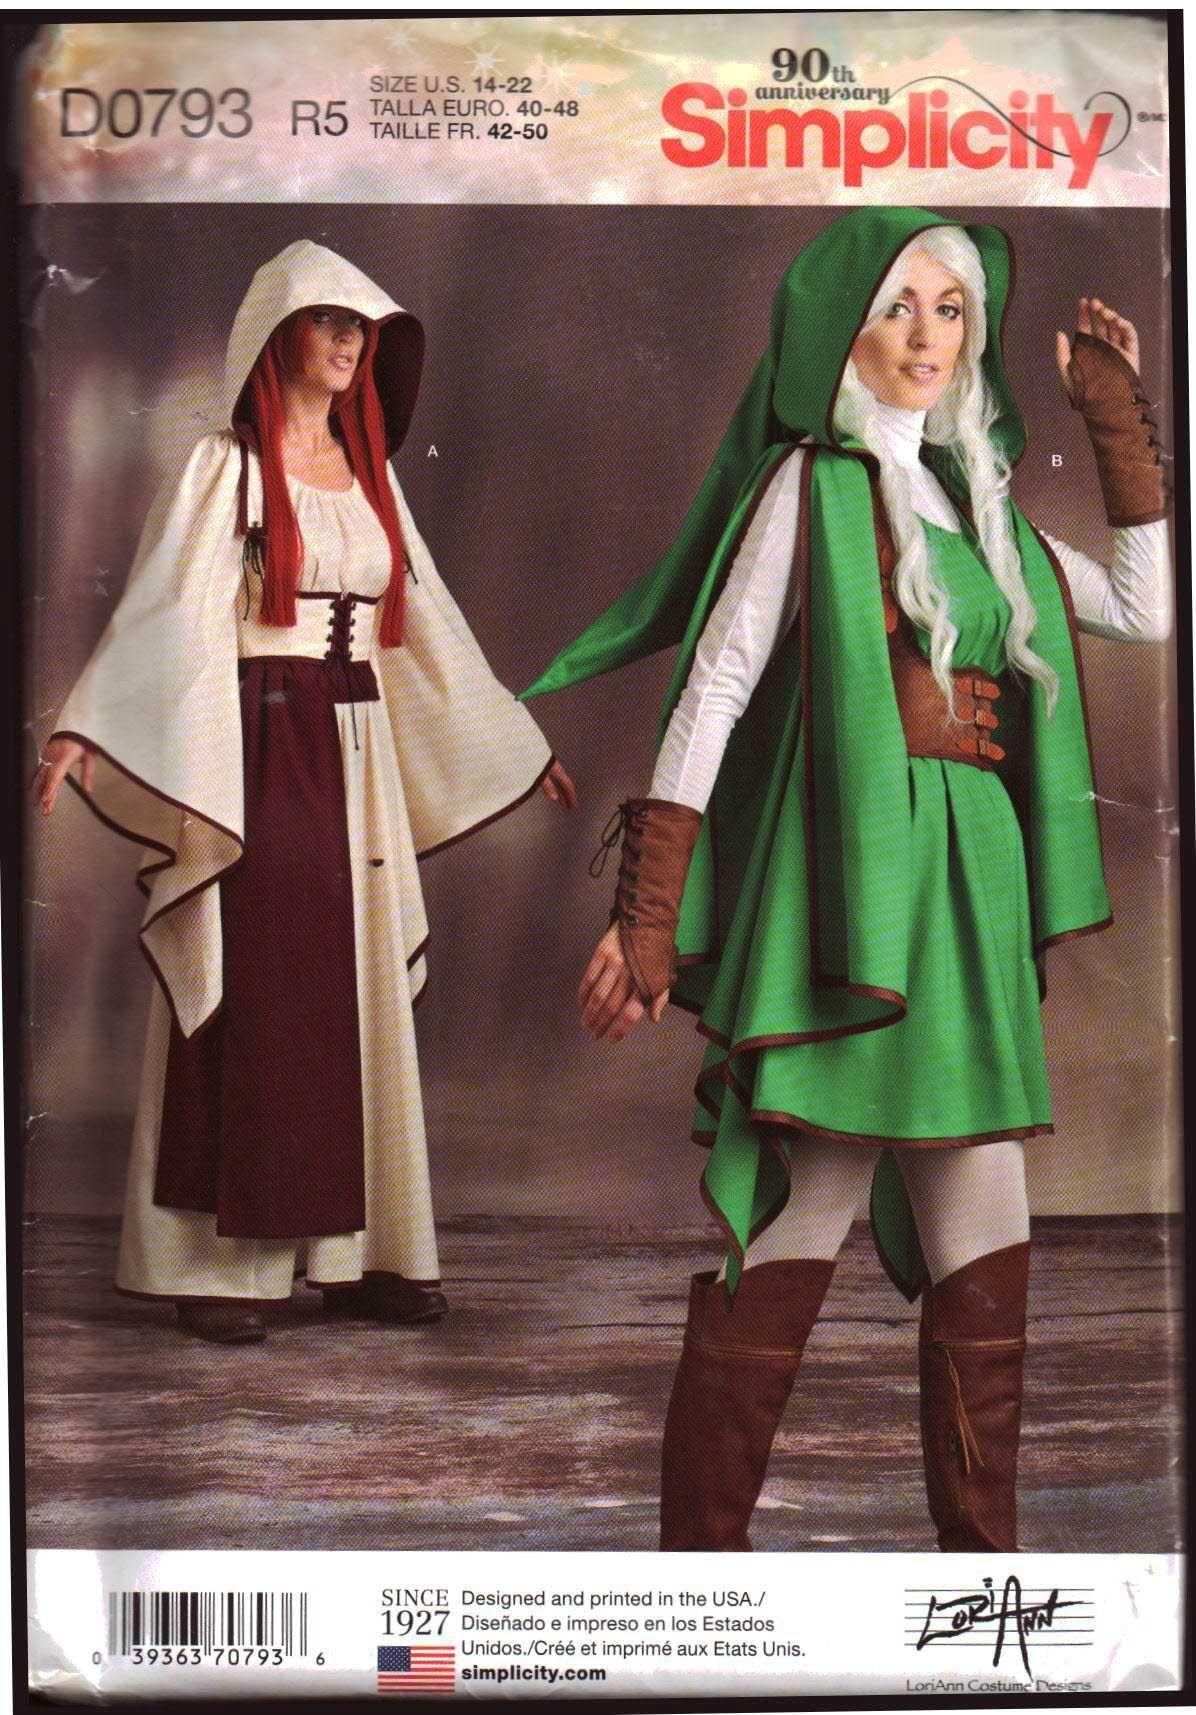 Simplicity D0793 Zelda Costume Size R5 1422 Uncut Sewing